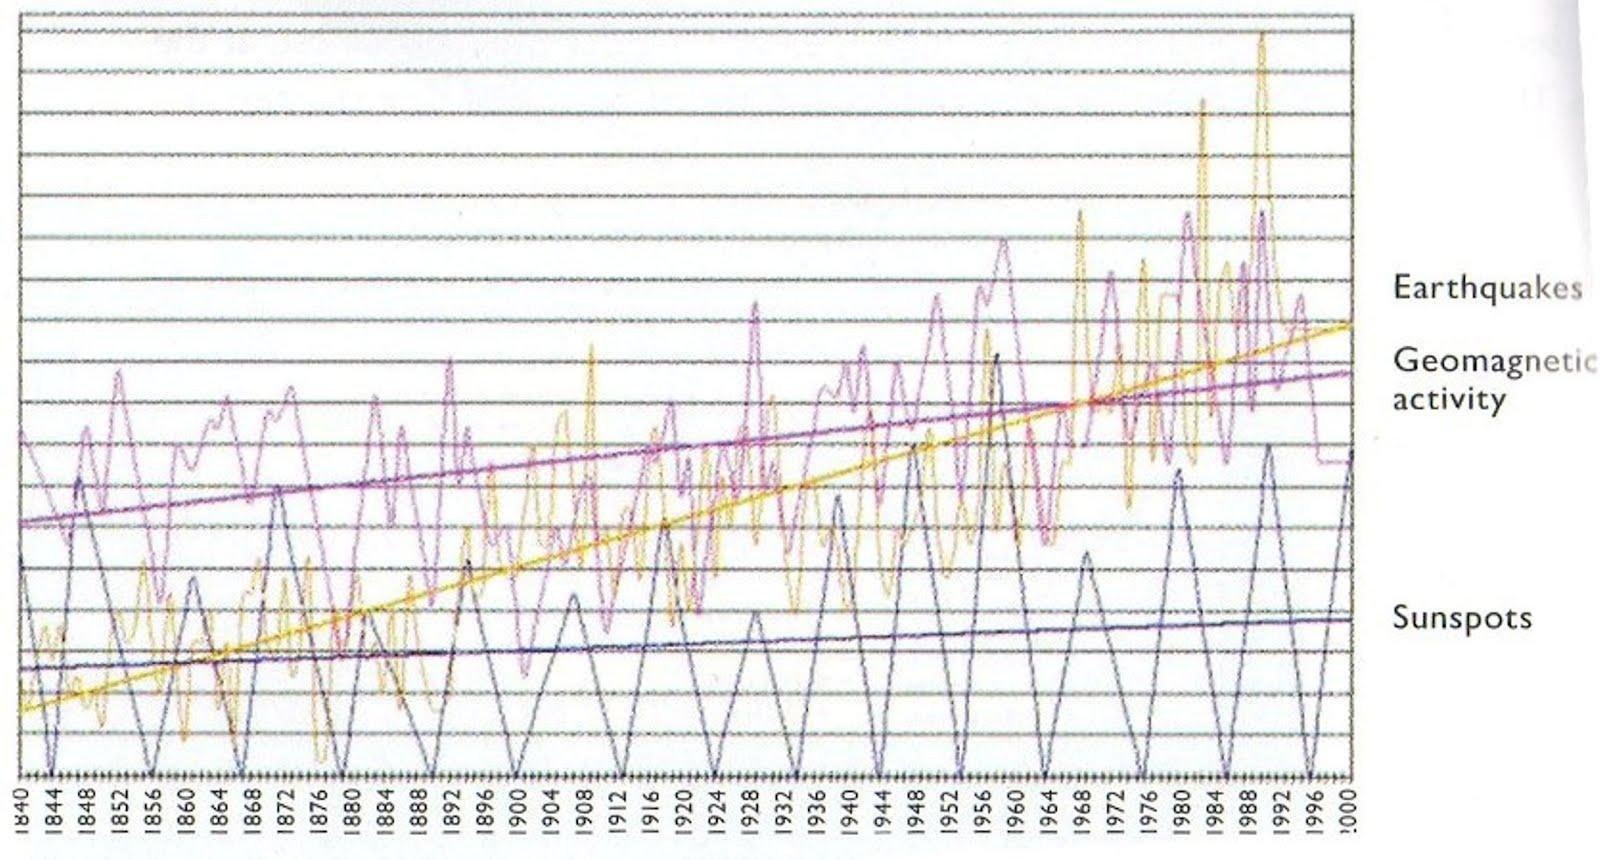 Solarflarescauseearthquakesandfloods Earthquake Incidents Are On The Increase Aph